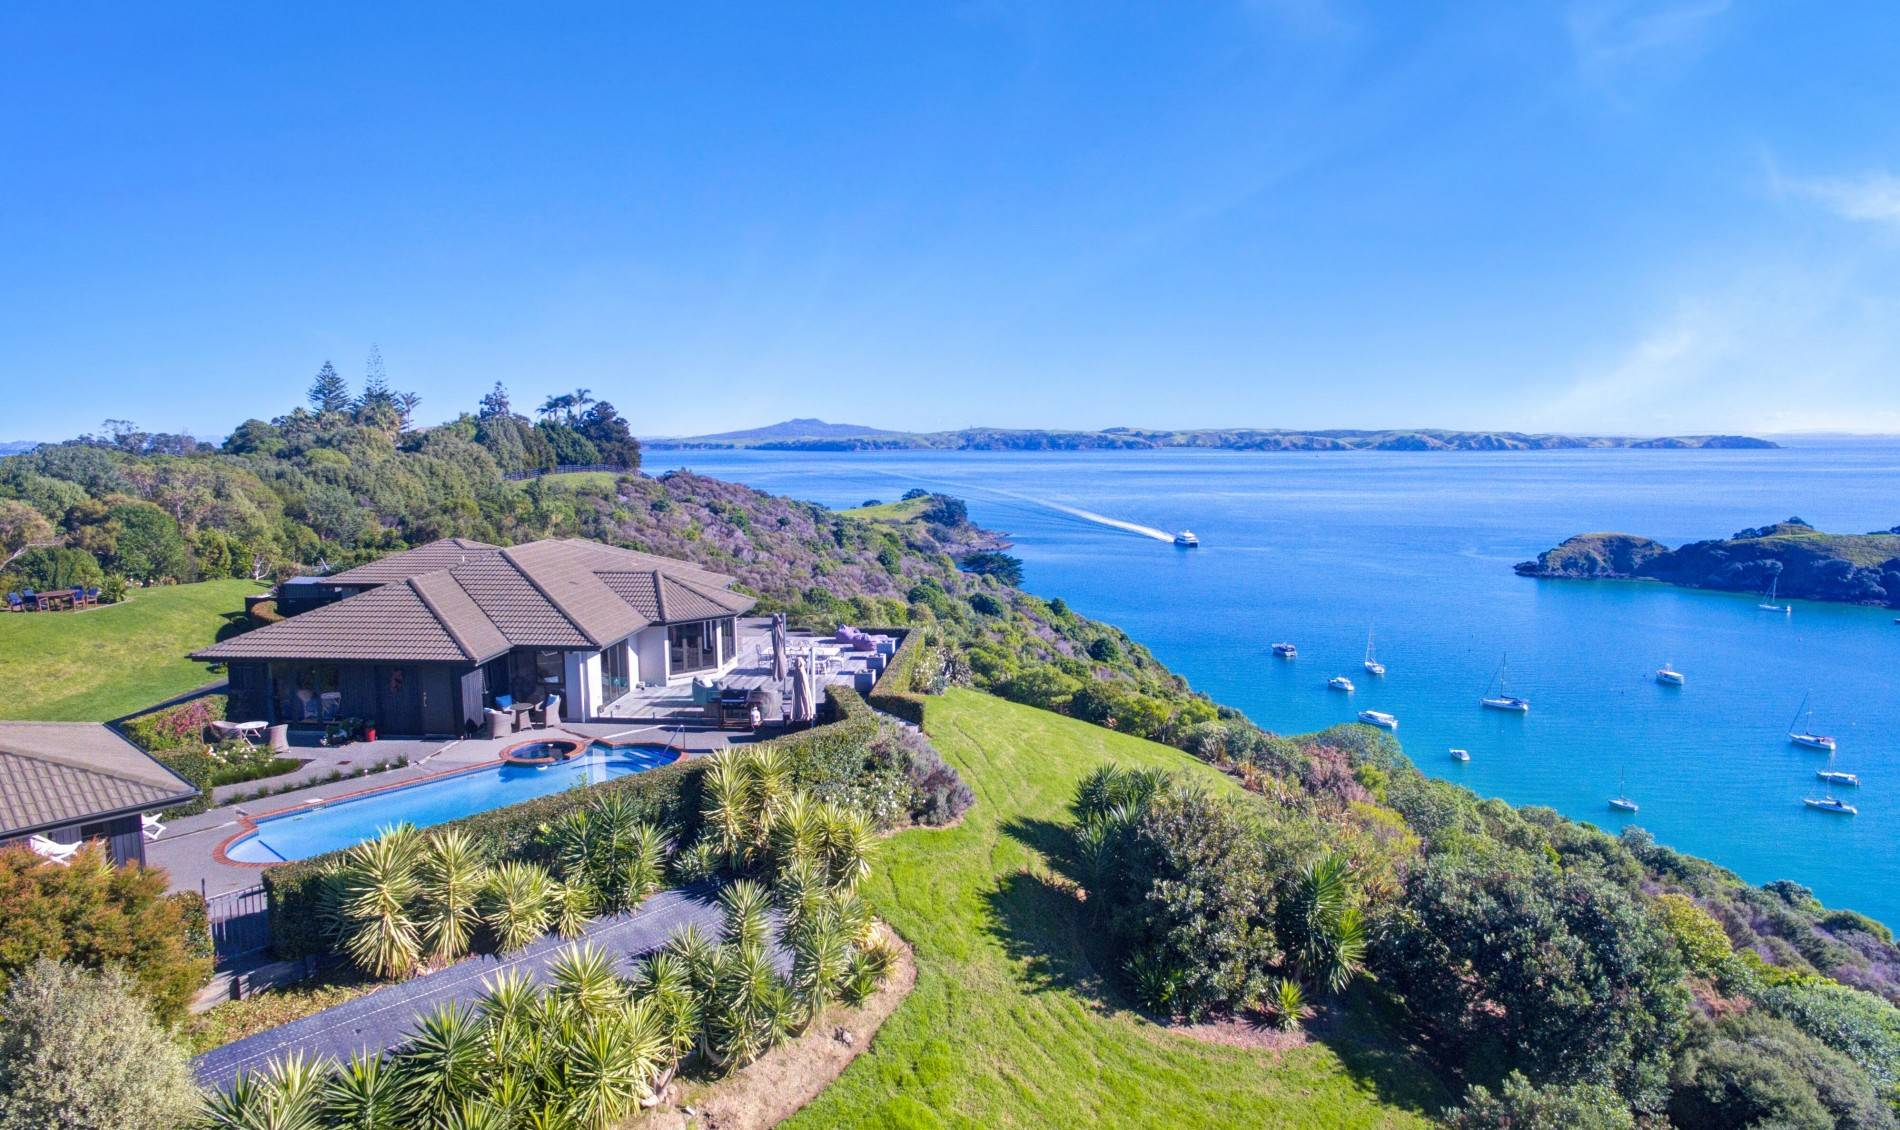 5 Bedroom Family Holiday Home in Waiheke Island, New Zealand